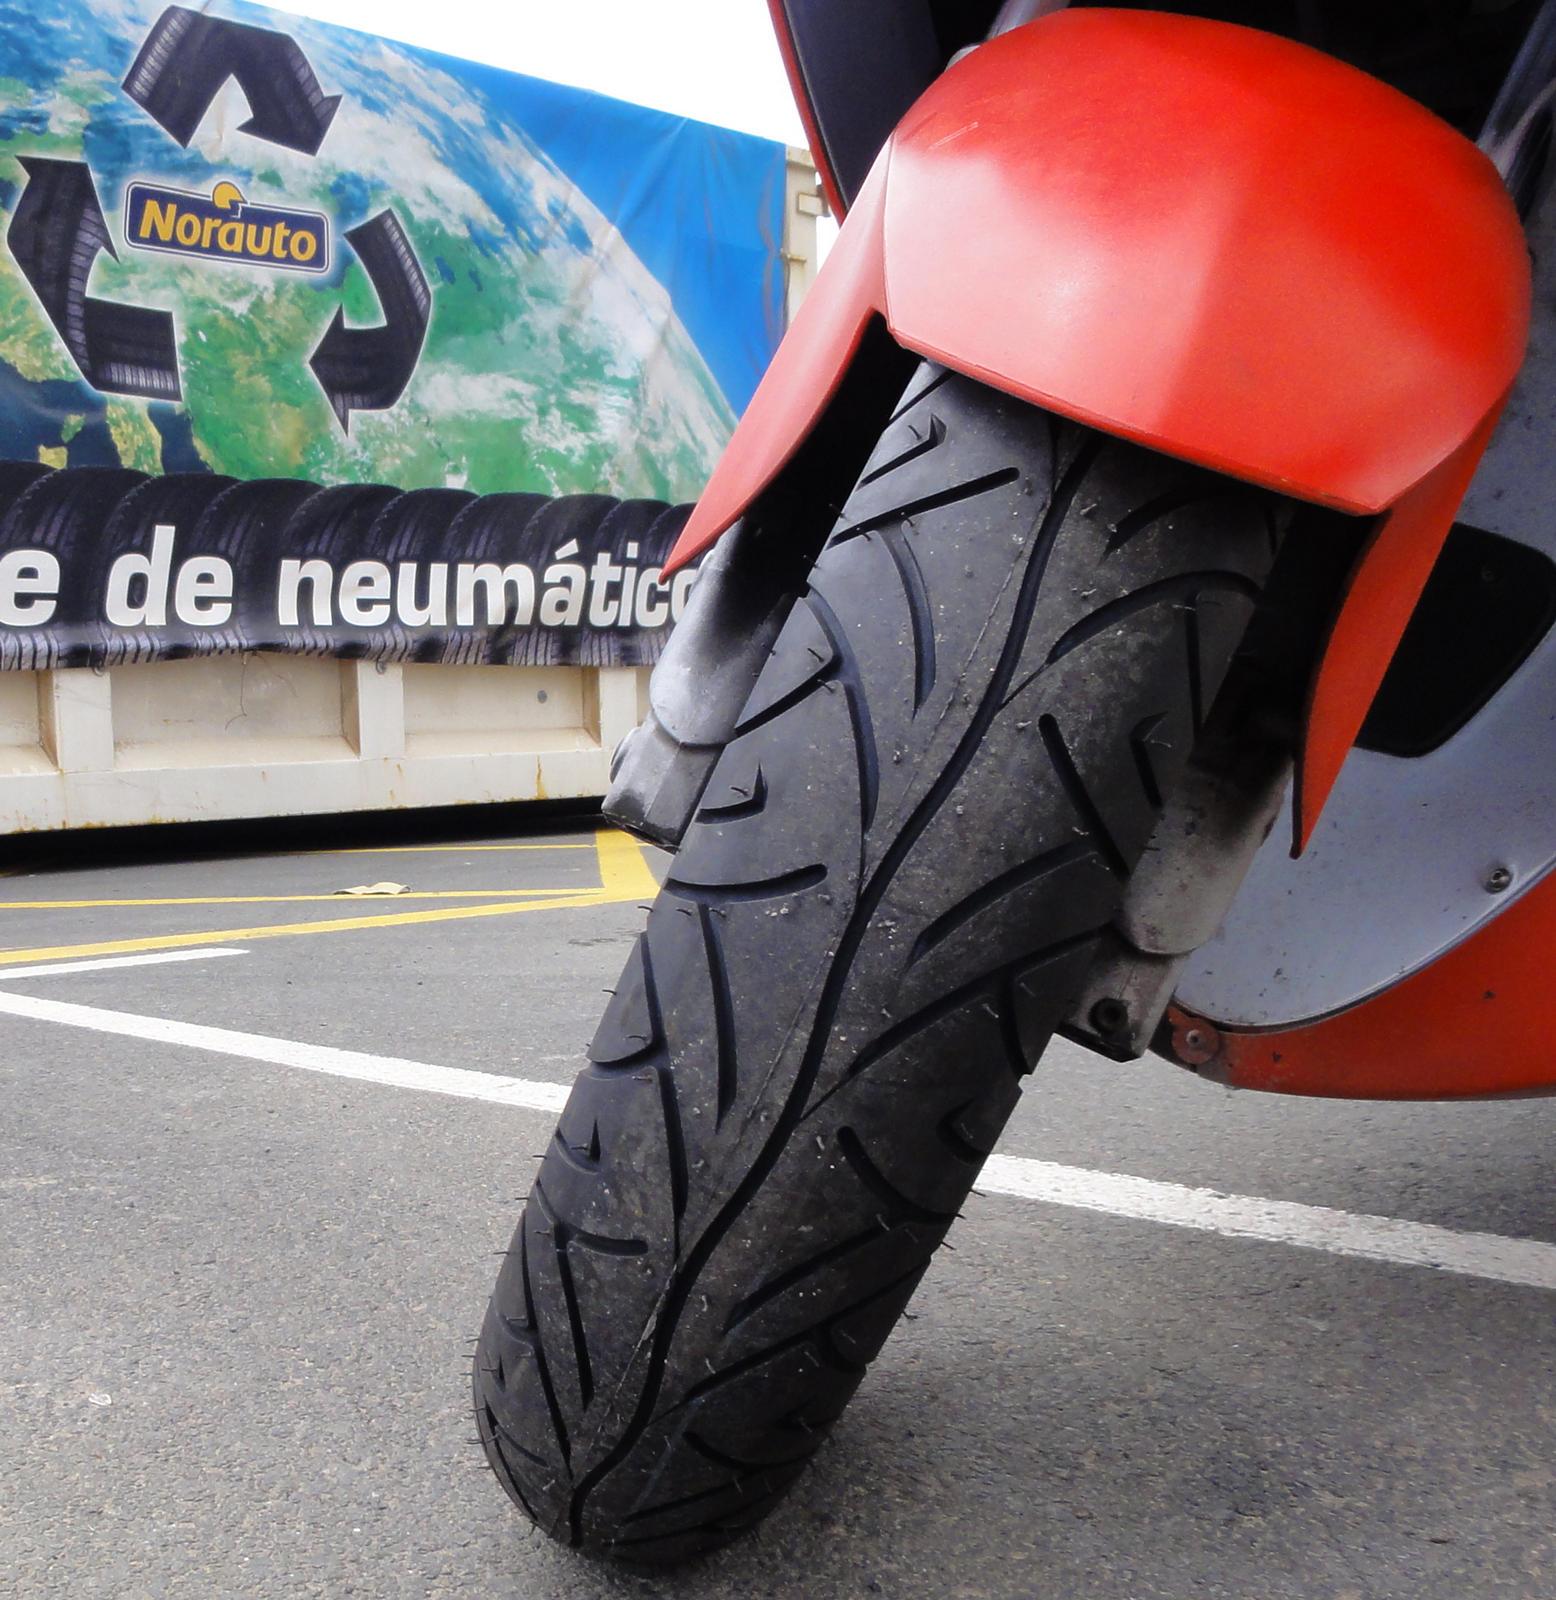 http://2.bp.blogspot.com/_HXaPyG-SY44/TD9Dp0qFa5I/AAAAAAAACrU/kypwgxXZh-M/s1600/malaguti+spidermax+pirelly+sport+demon+front+tire.jpg